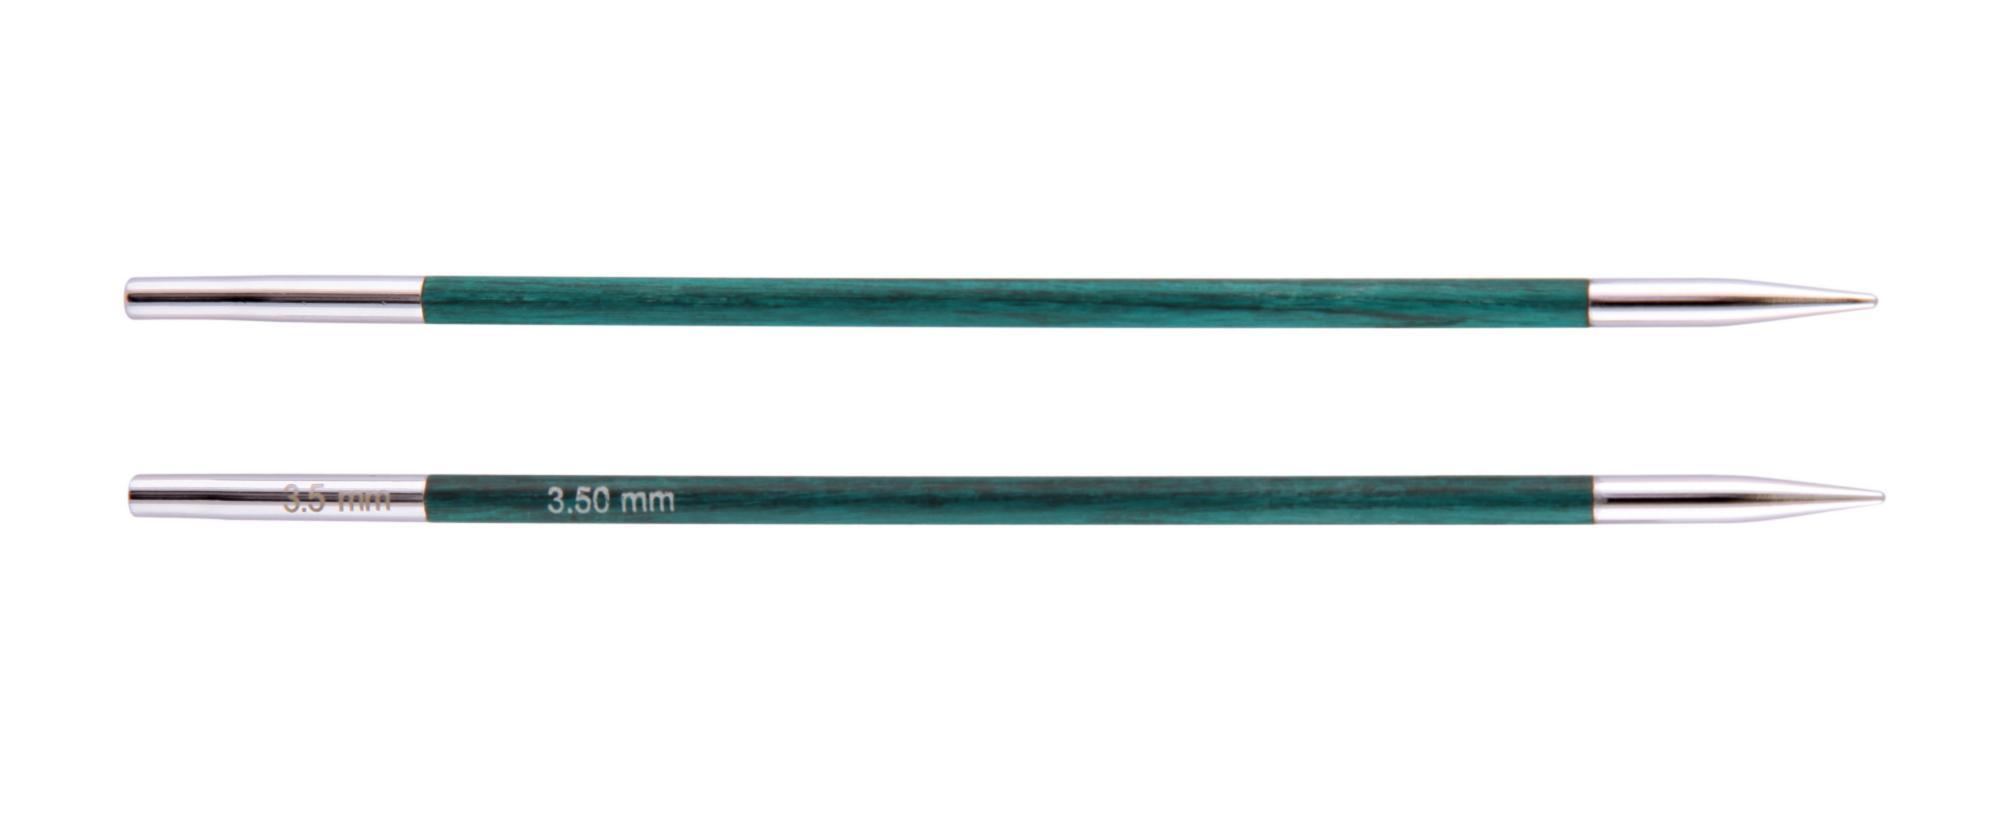 Спицы съемные Royale KnitPro, 29253, 3.50 мм